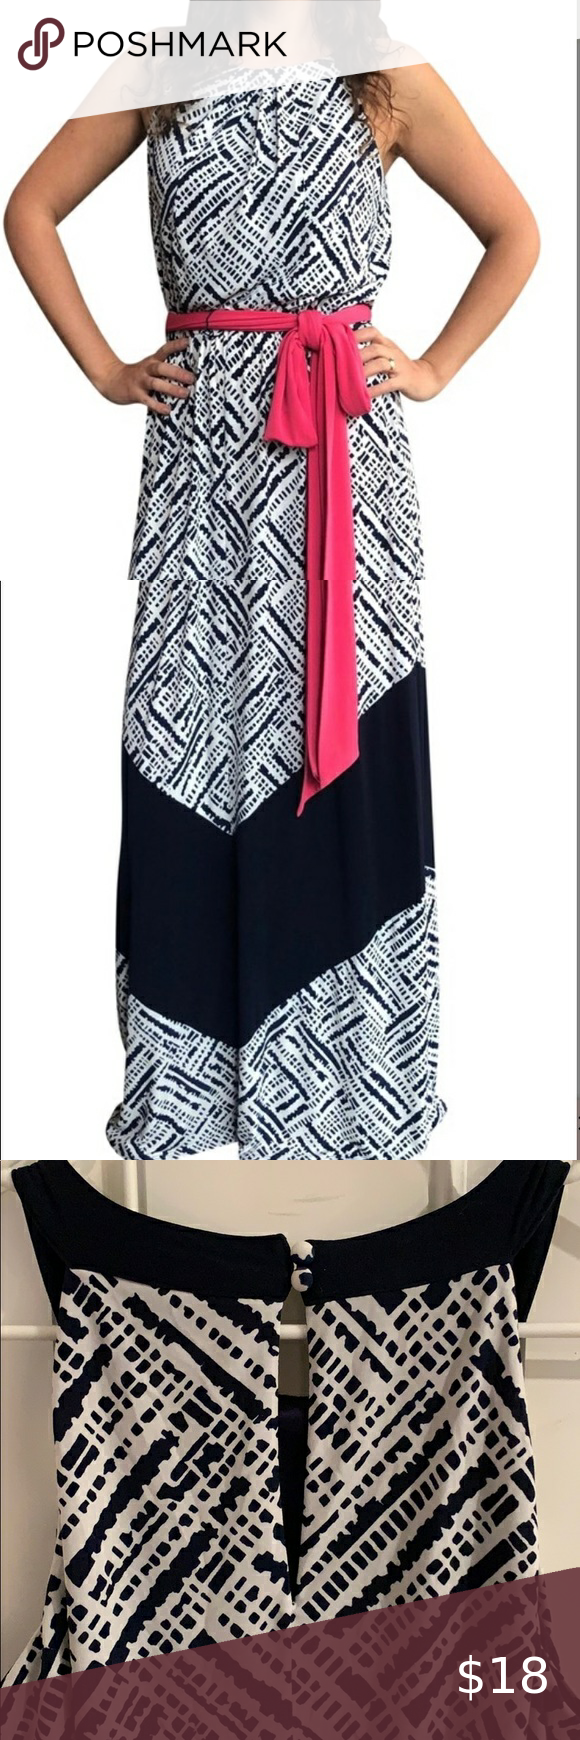 Vince Camuto Maxi Dress Maxi Dress Pattern Maxi Dress Dresses [ 1740 x 580 Pixel ]